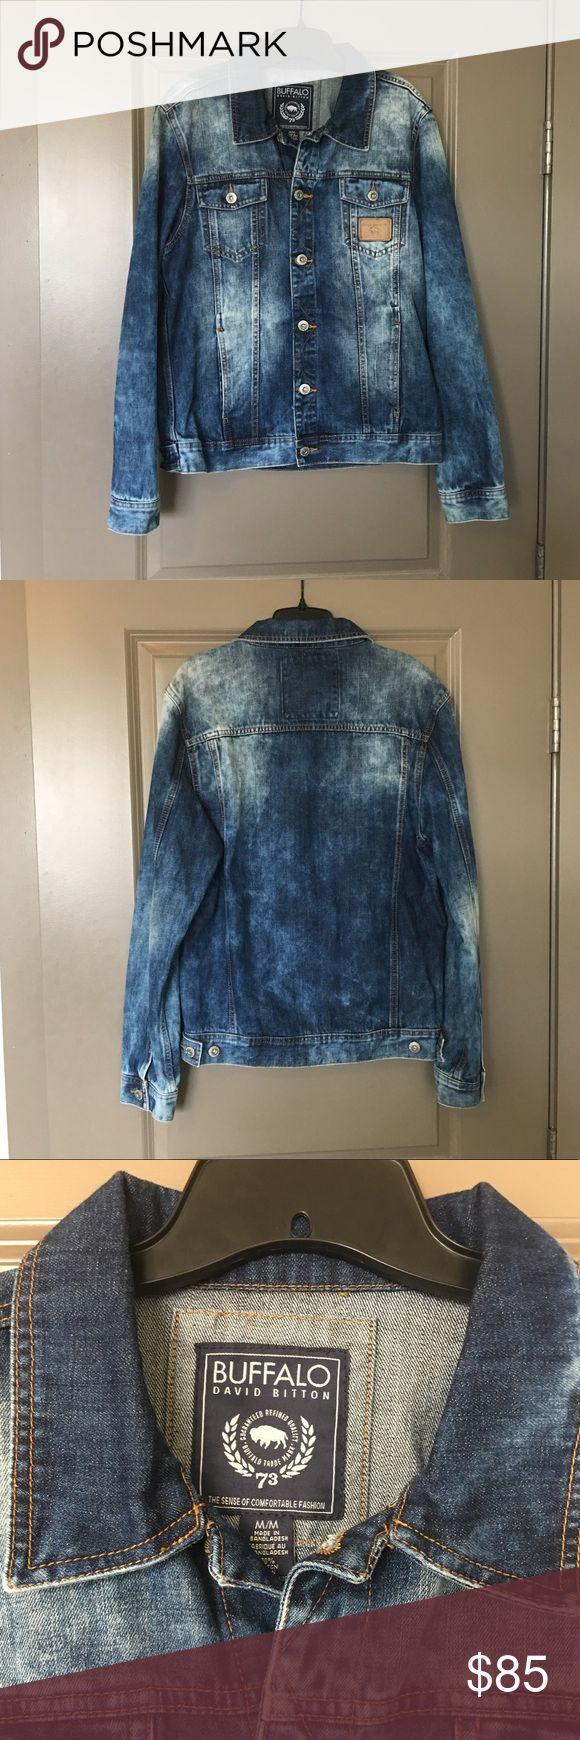 Buffalo David Bitton Jean Jacket Buffalo David Bitton men's size M faded jean jacket in perfect condition. Brand new, never worn. NWOT. Buffalo David Bitton Jackets & Coats